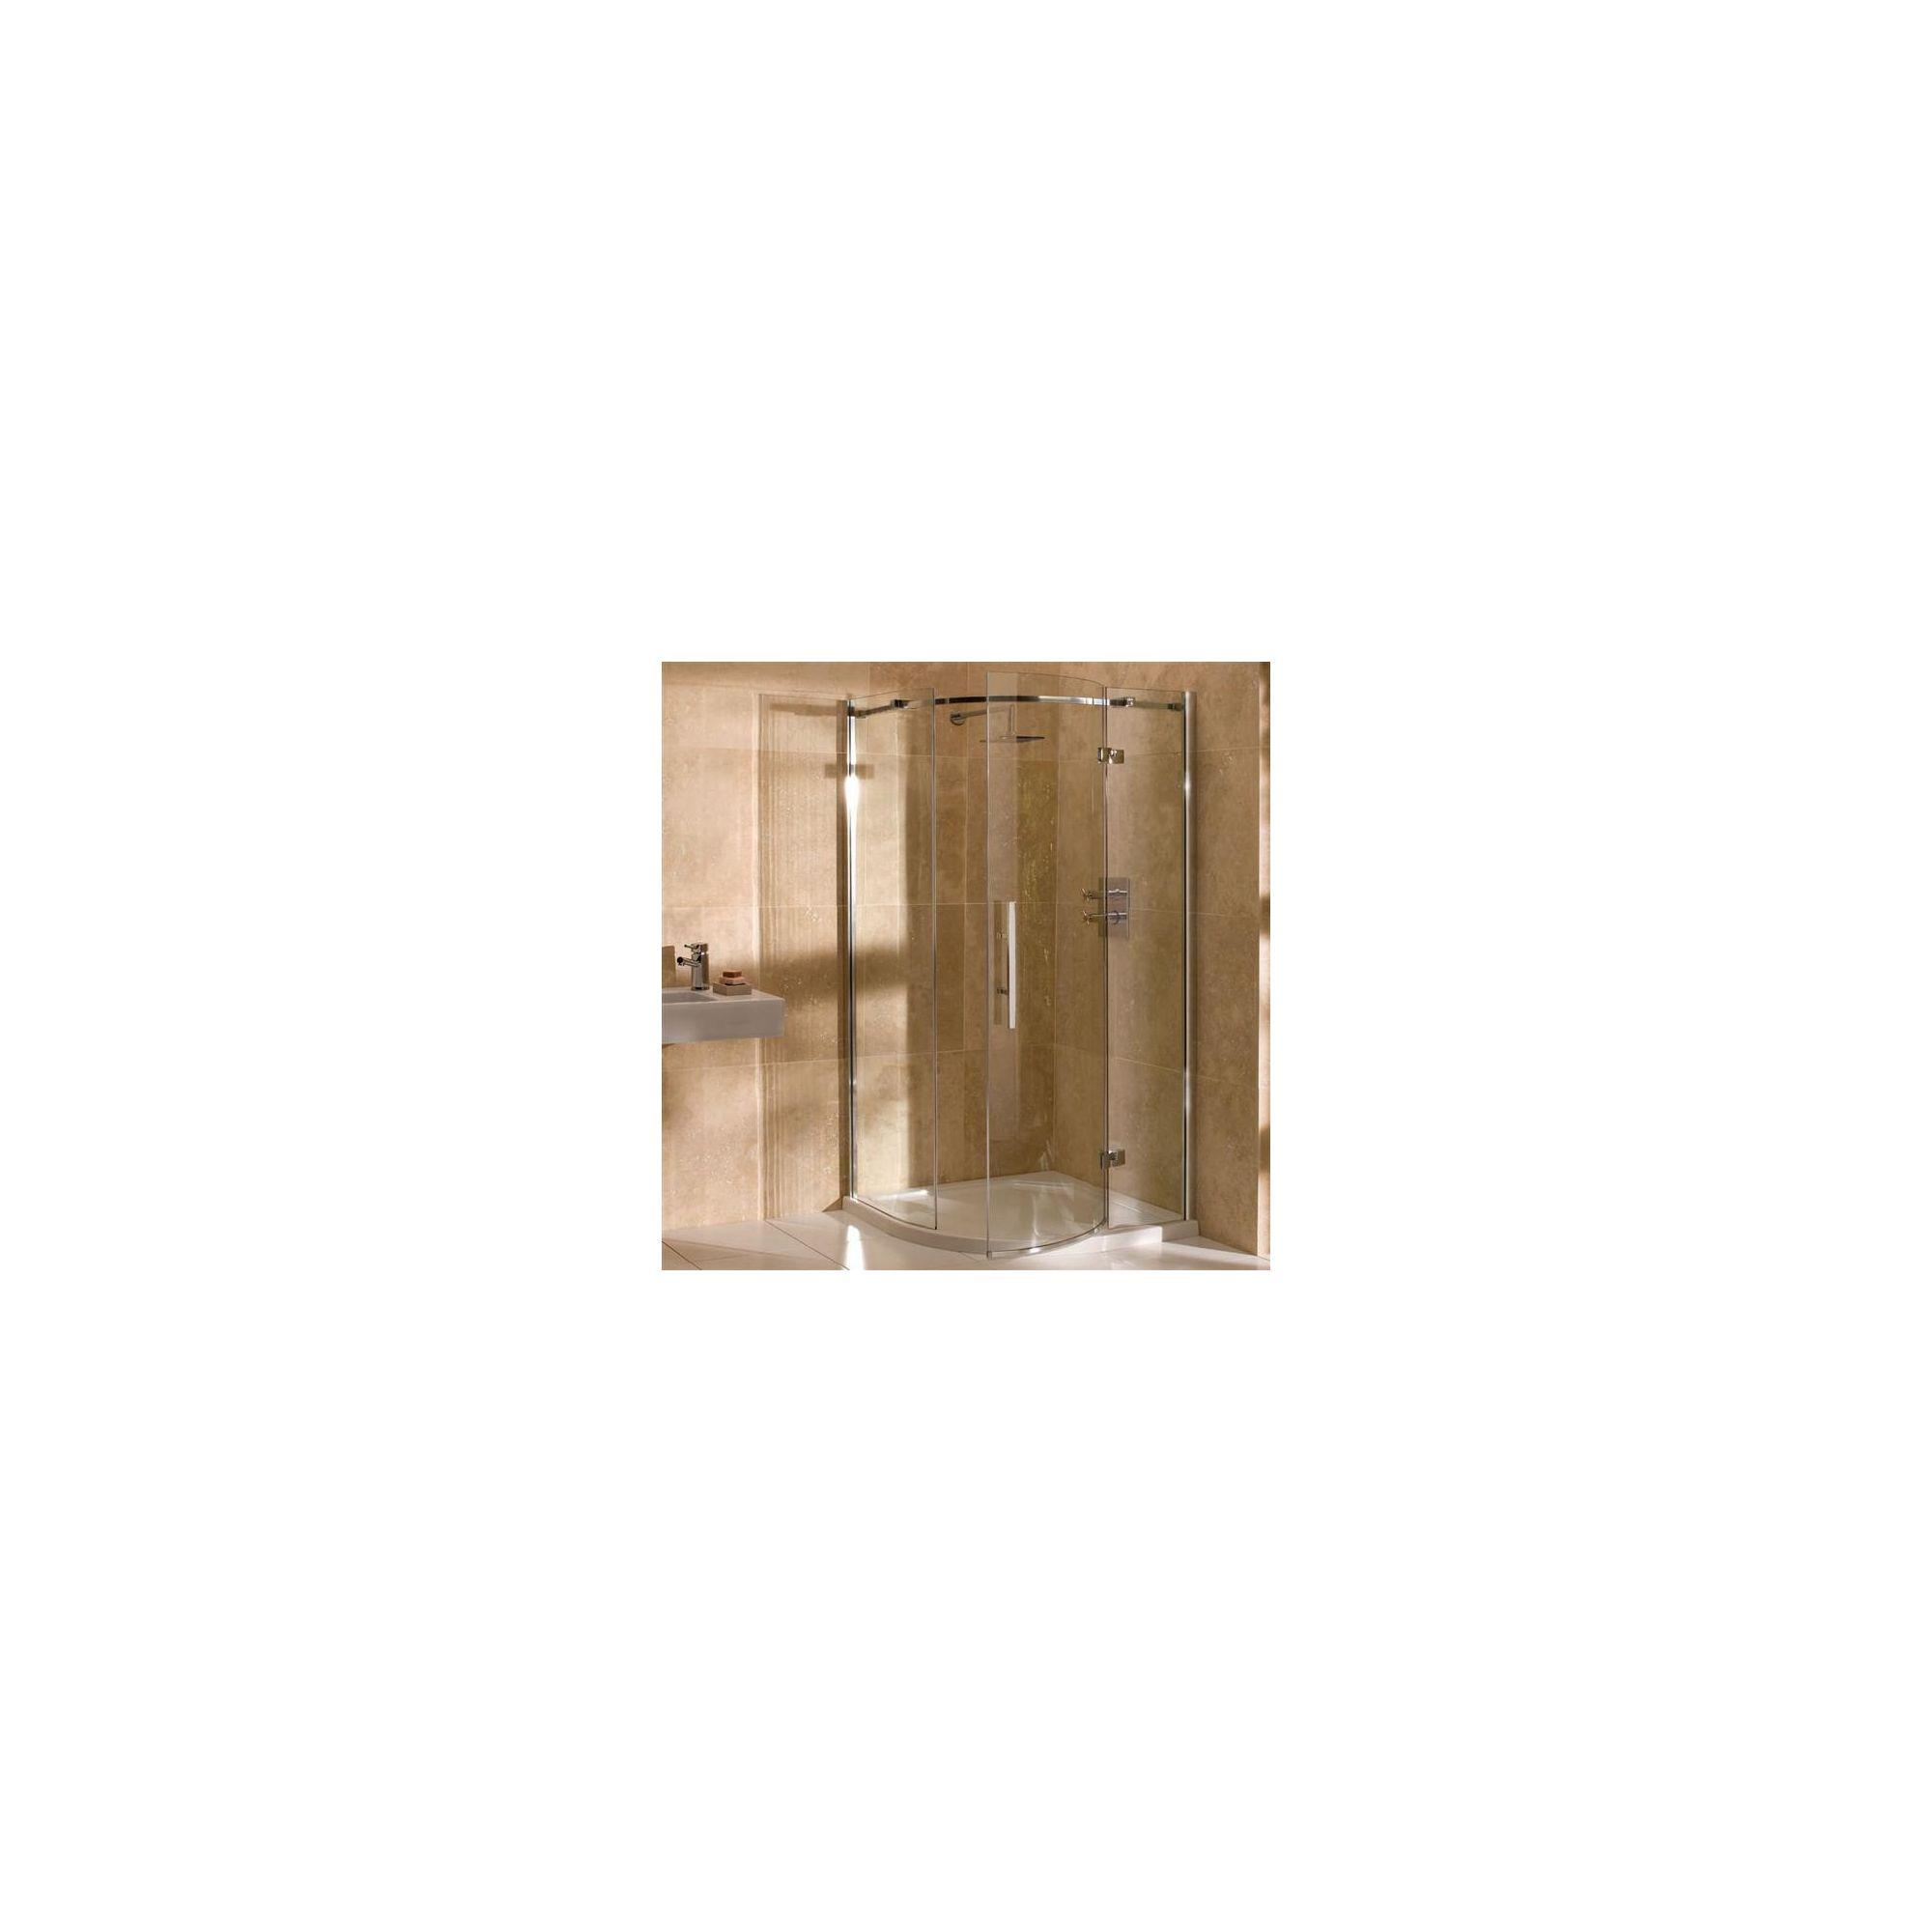 Merlyn Vivid Nine Quadrant Shower Door, 900mm x 900mm, Right Handed, 8mm Glass at Tesco Direct